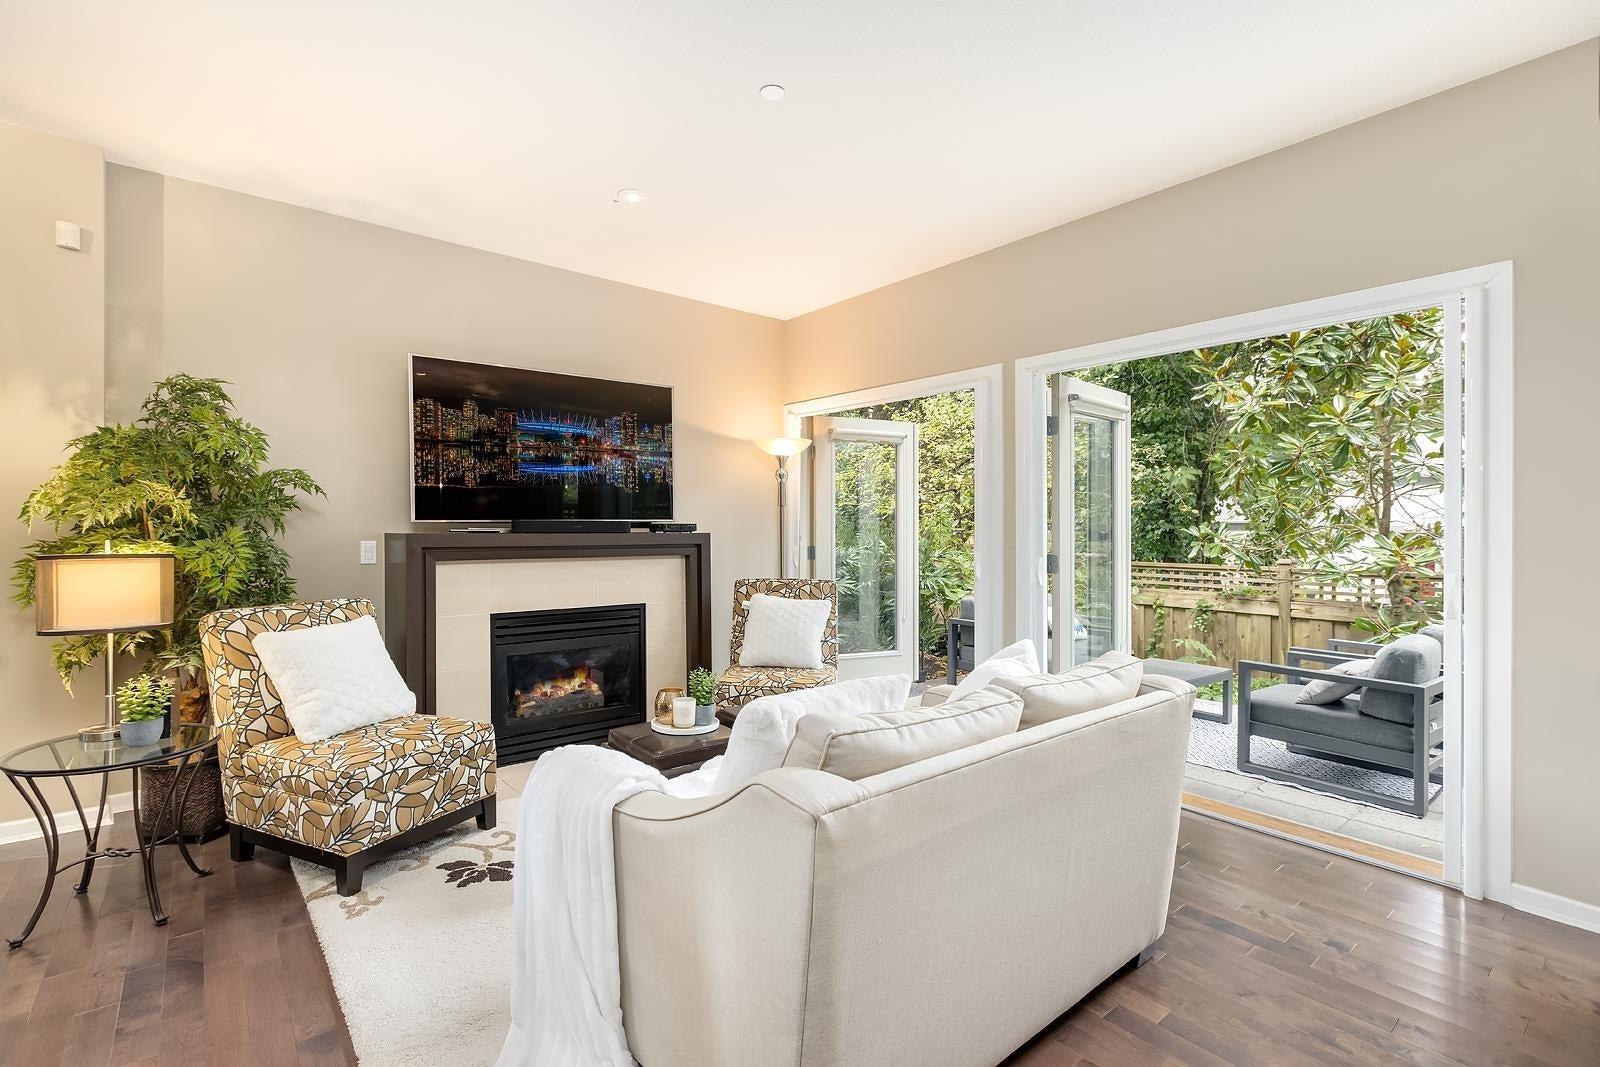 6 3750 EDGEMONT BOULEVARD - Edgemont Townhouse for sale, 4 Bedrooms (R2617117) - #9